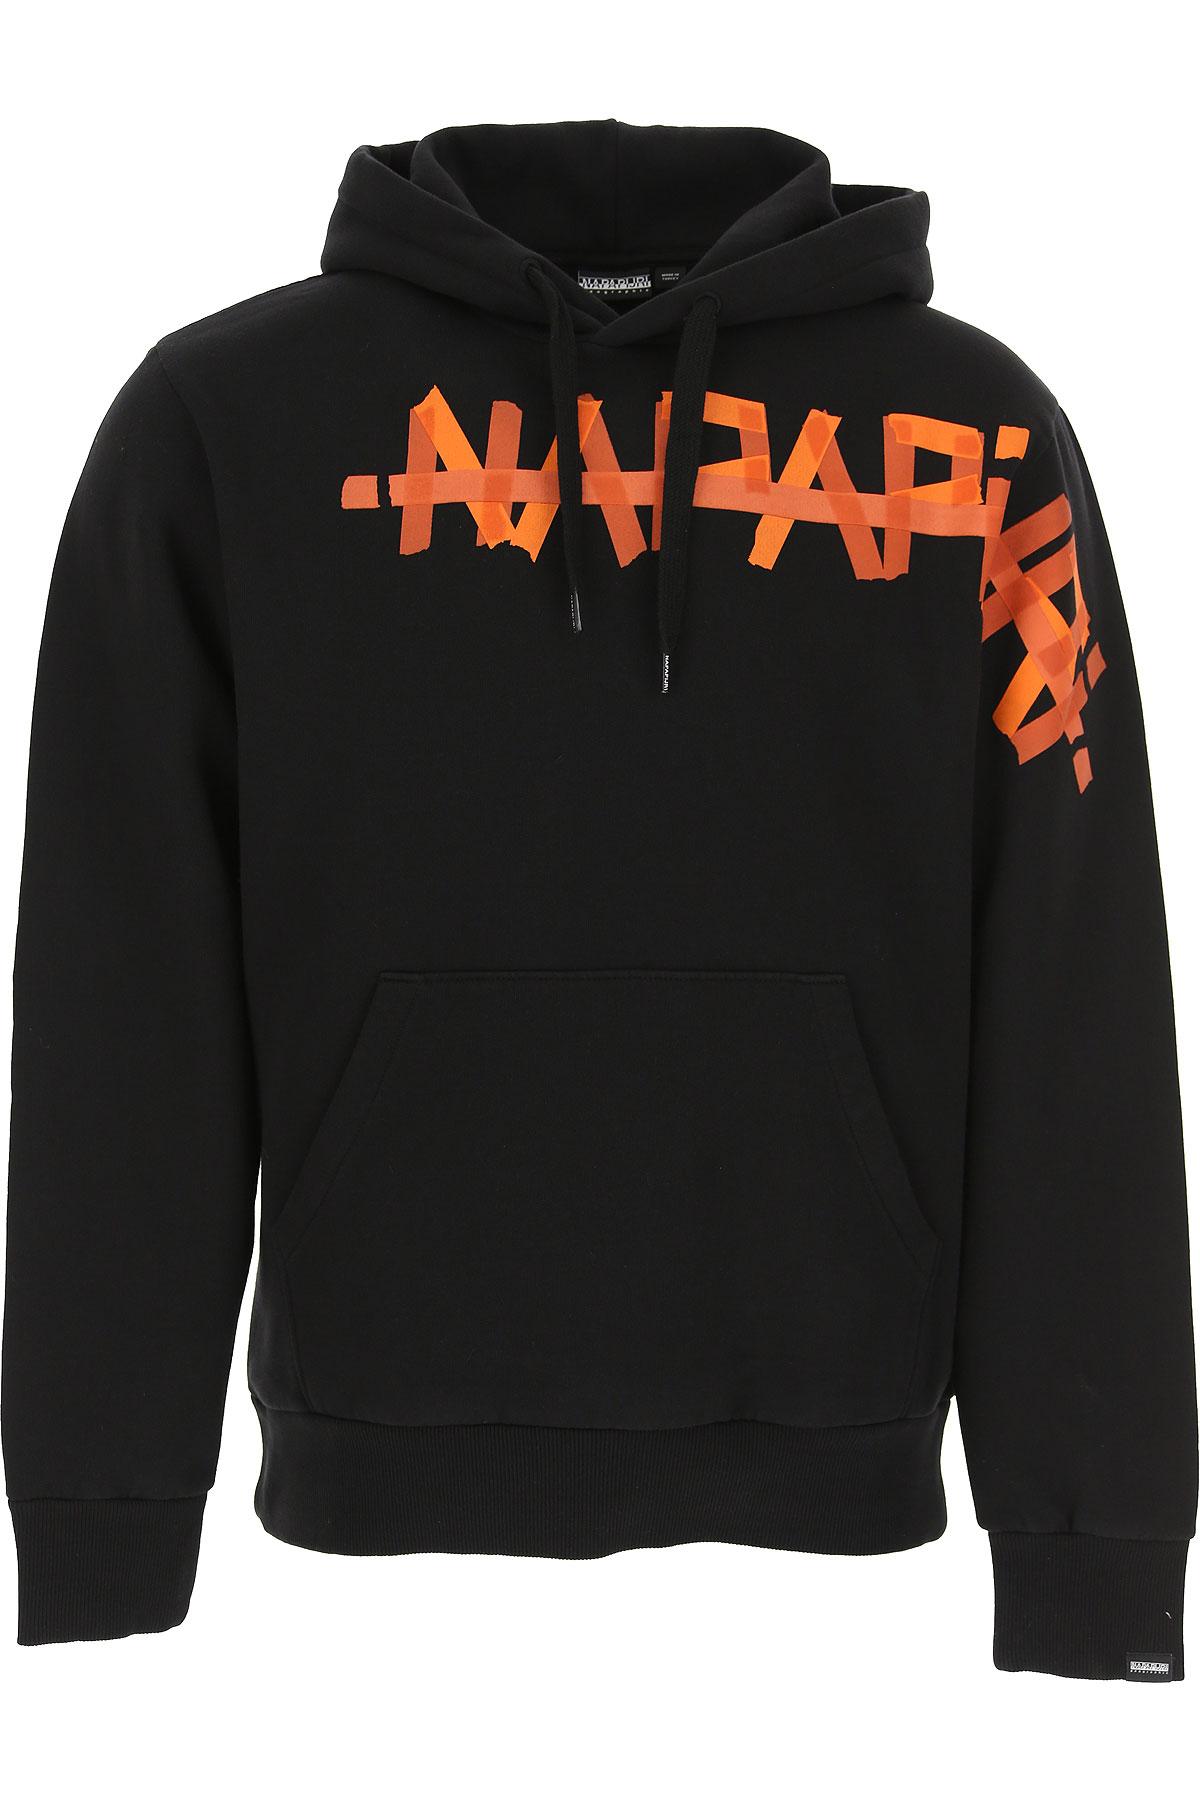 Napapijri Sweatshirt for Men On Sale, Black, Cotton, 2019, M S XL